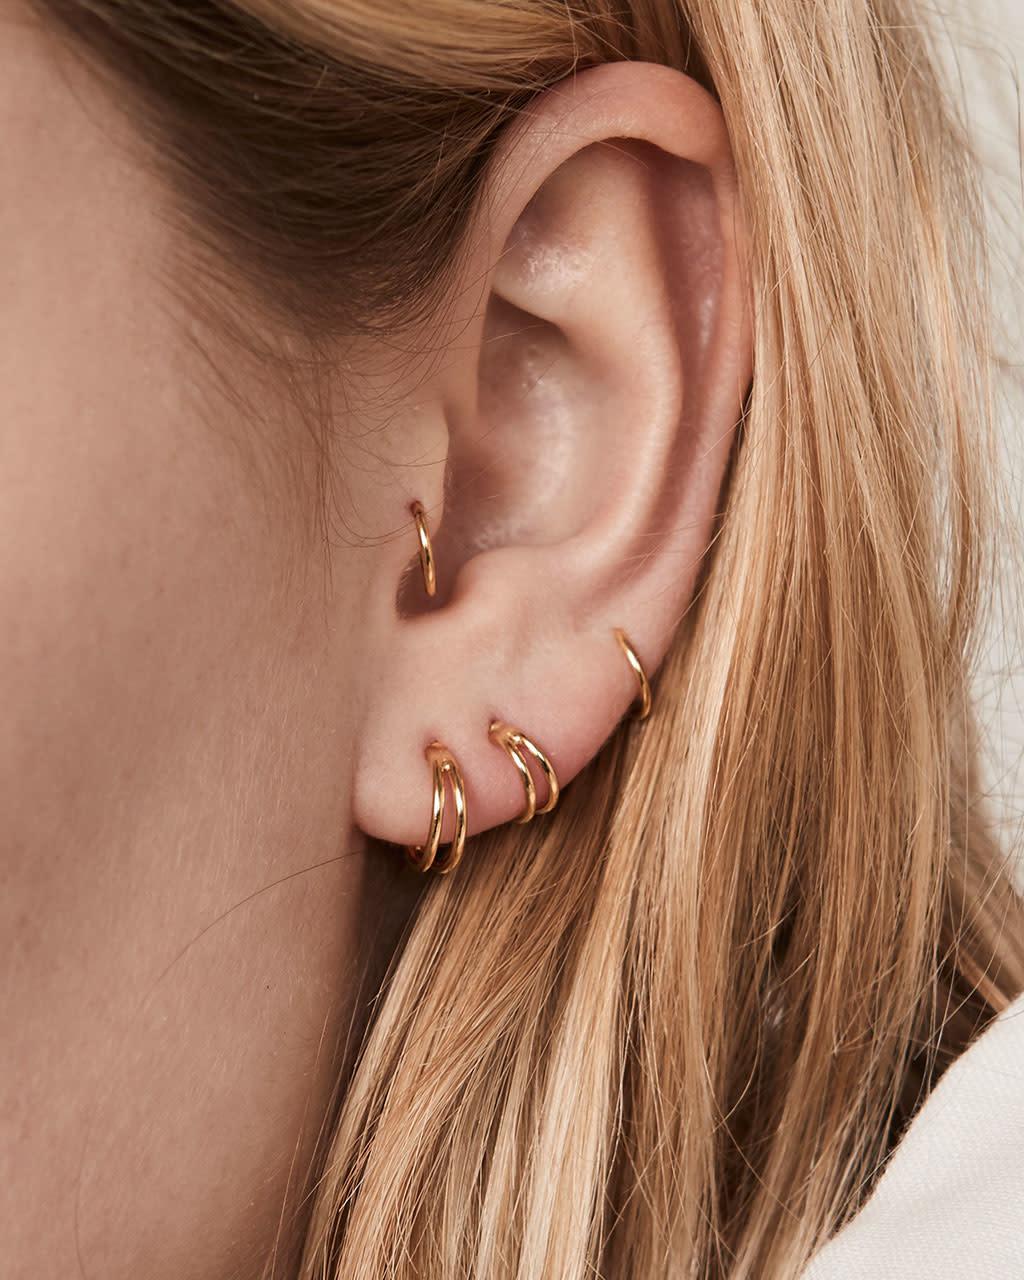 7d3dd5b1ac9ee Fashionology FY Double Hoop Earring Gold 10mm